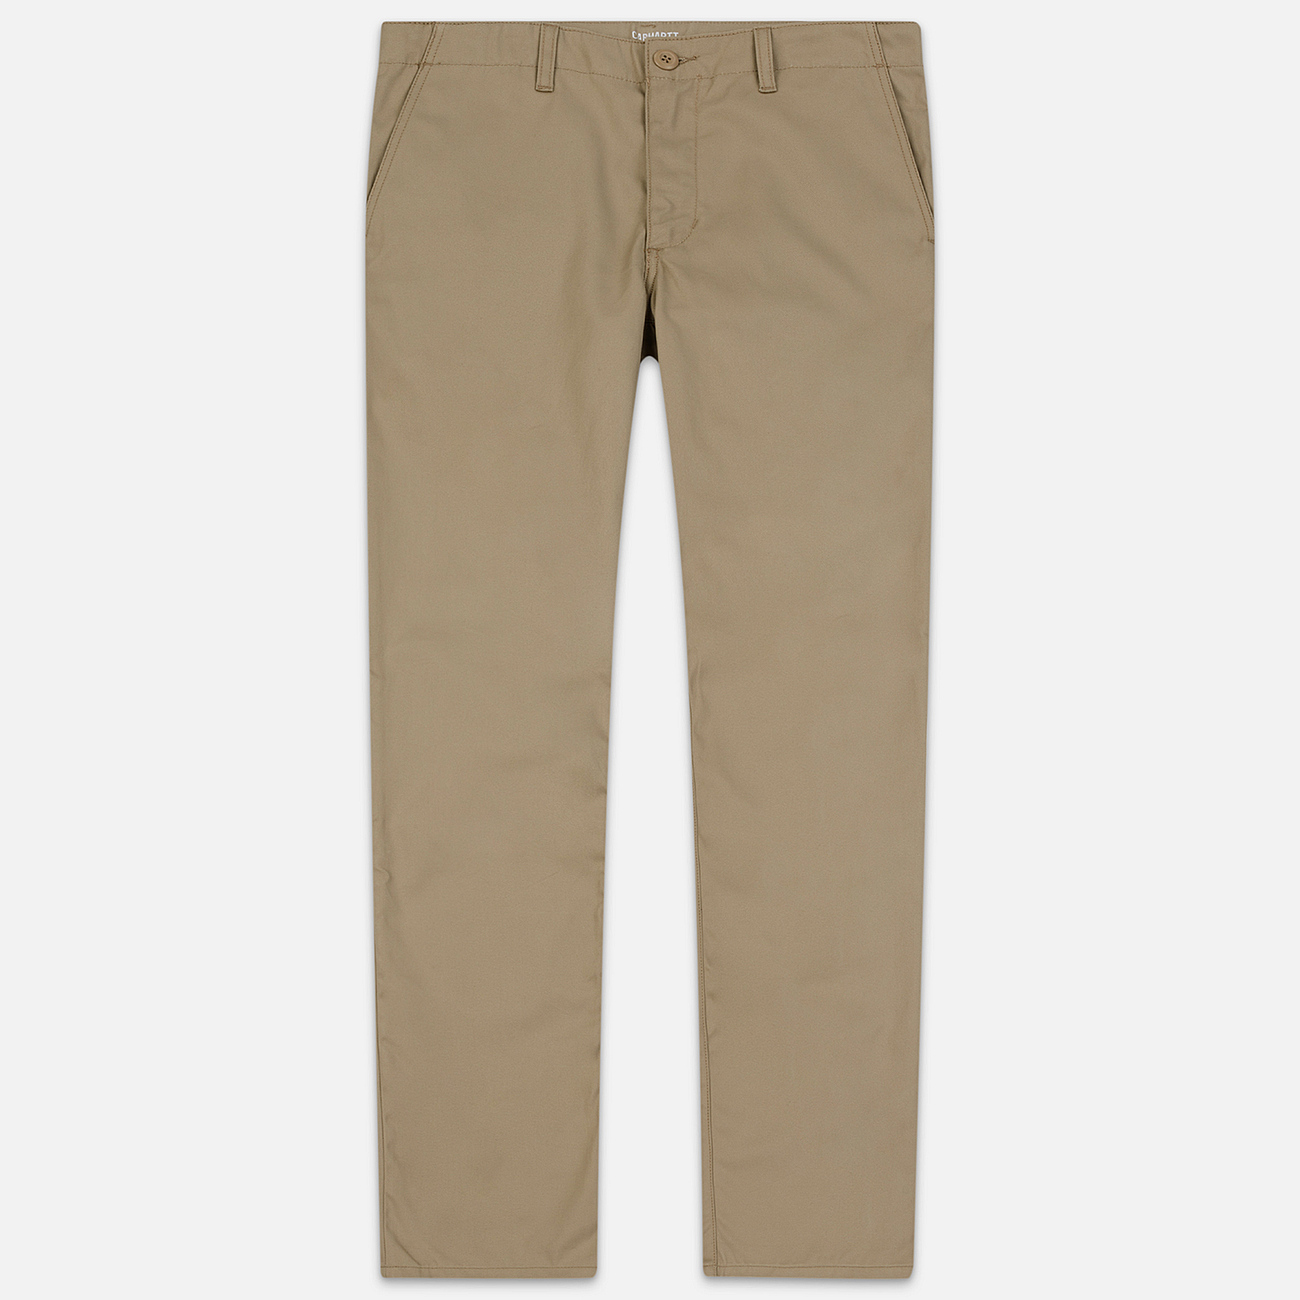 Мужские брюки Carhartt WIP Club 9 Oz Leather Rigid